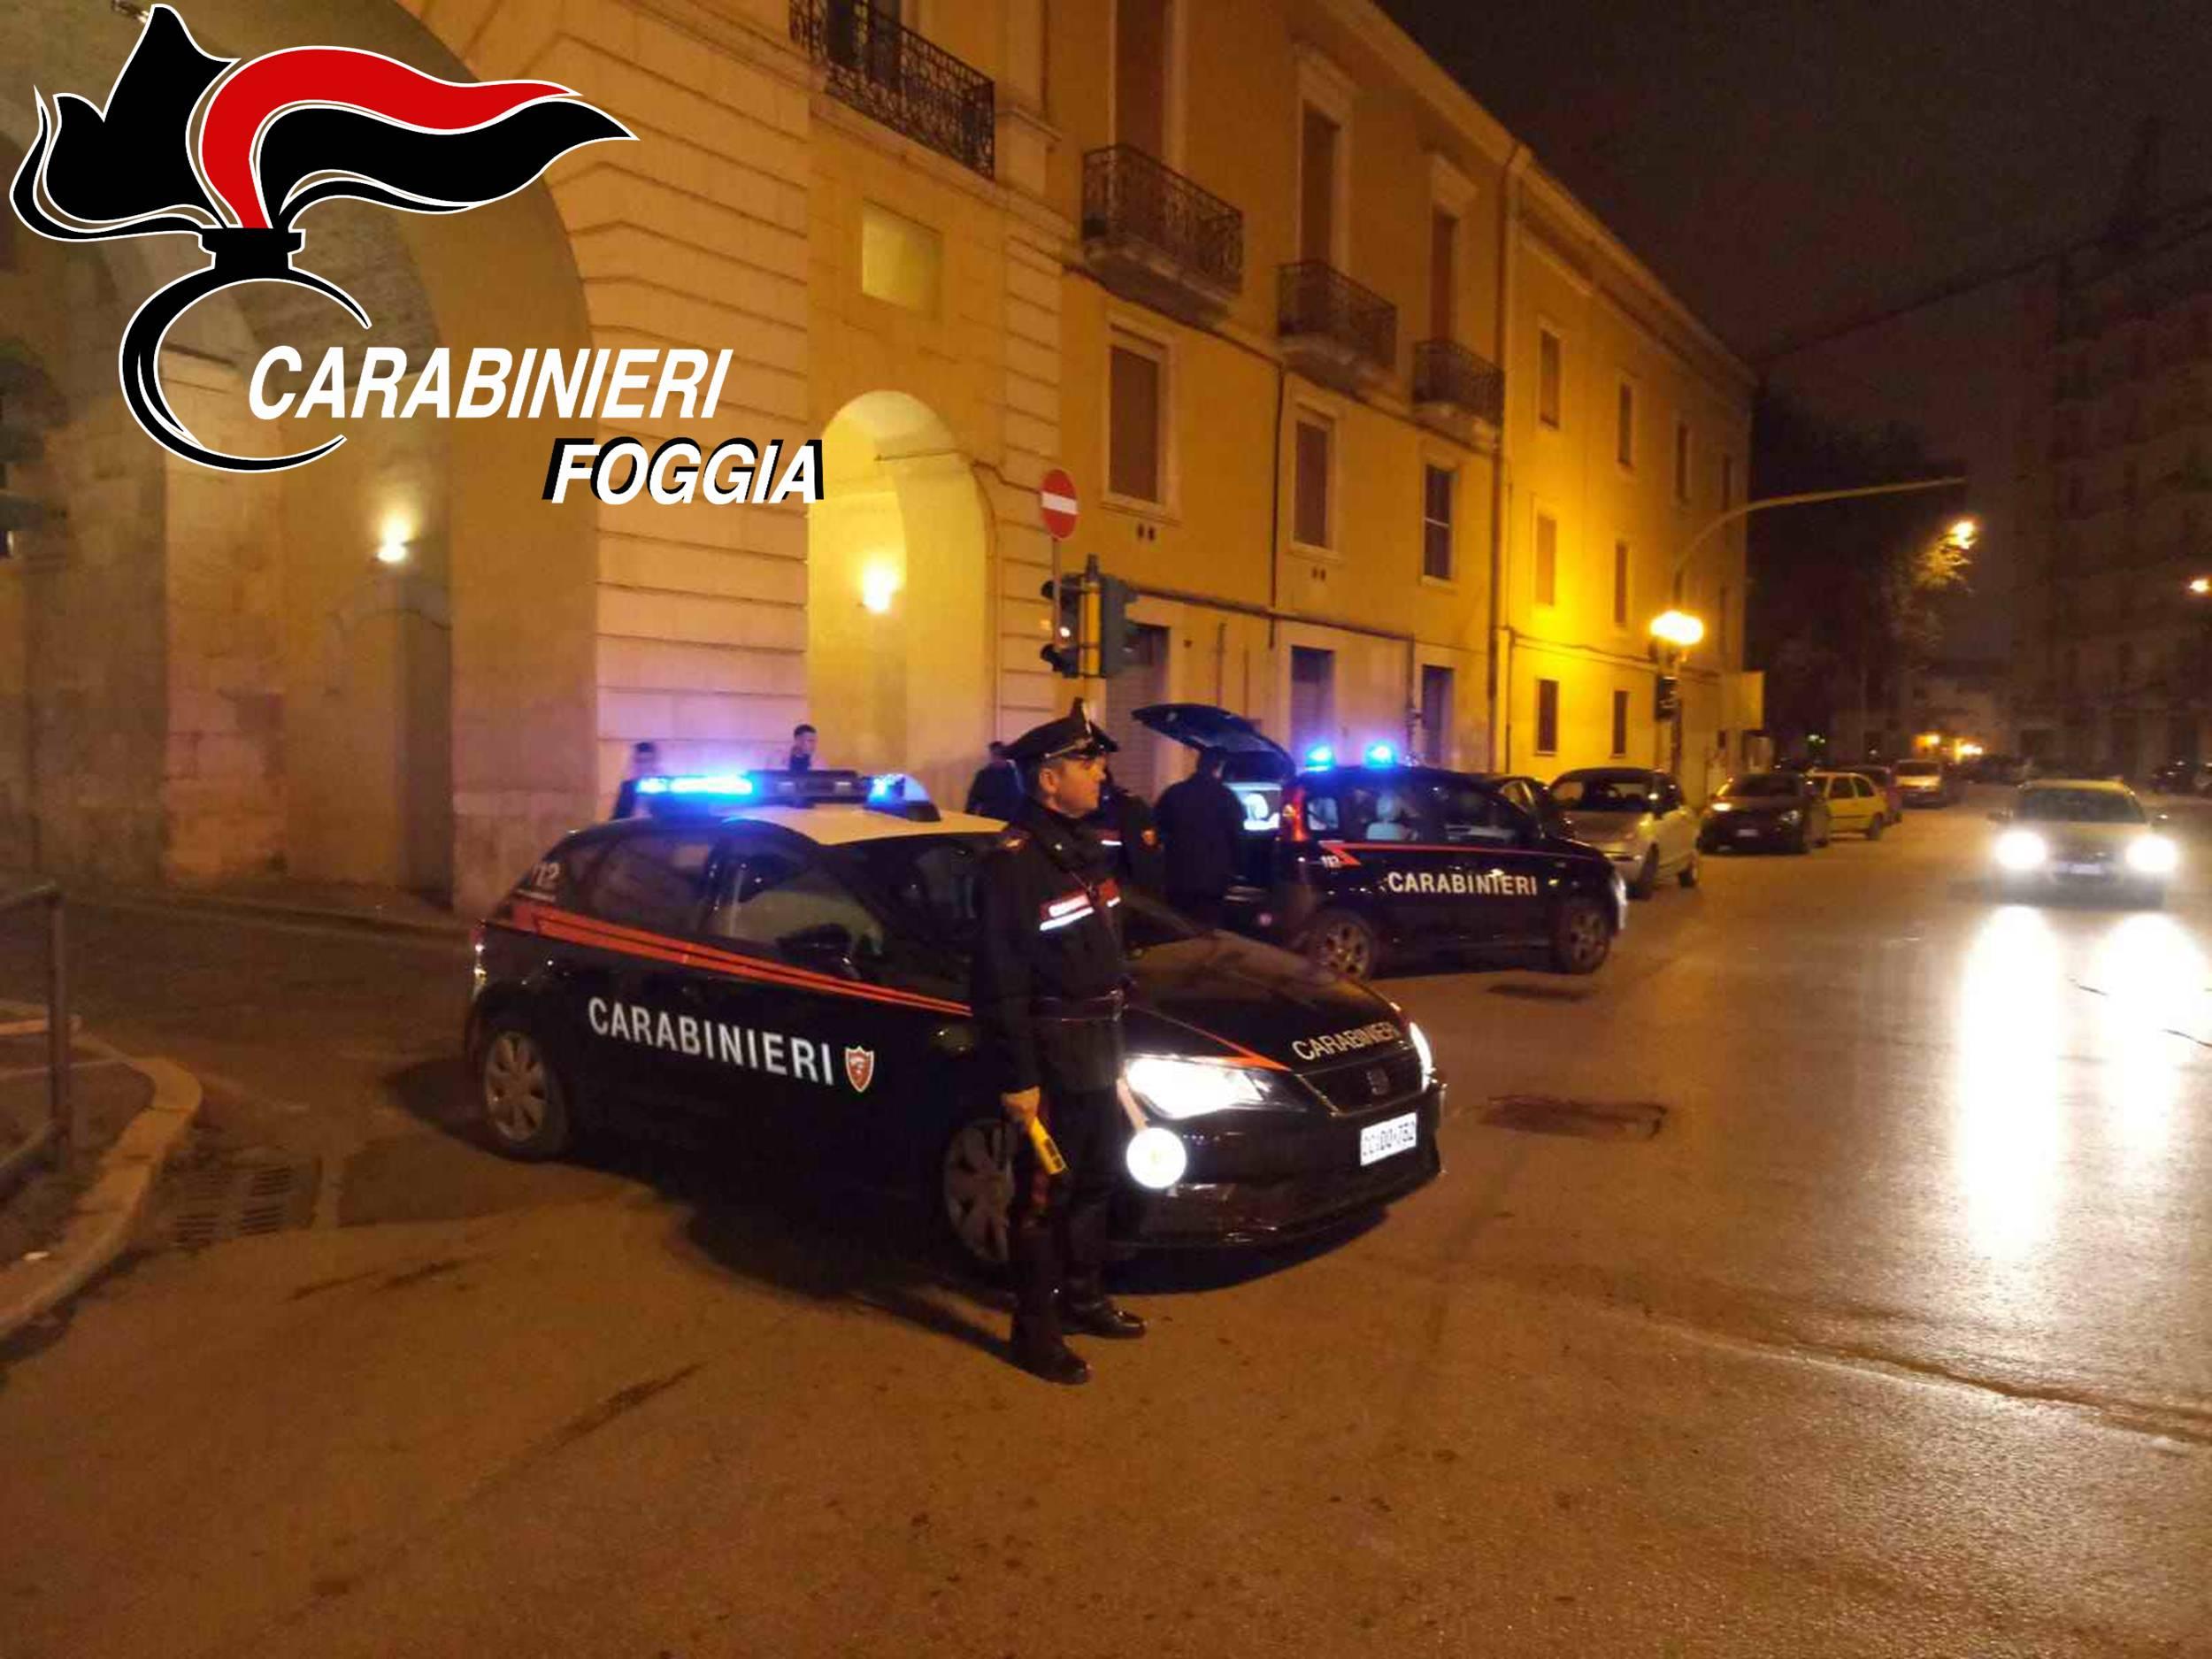 Carabinieri servizio antisballo